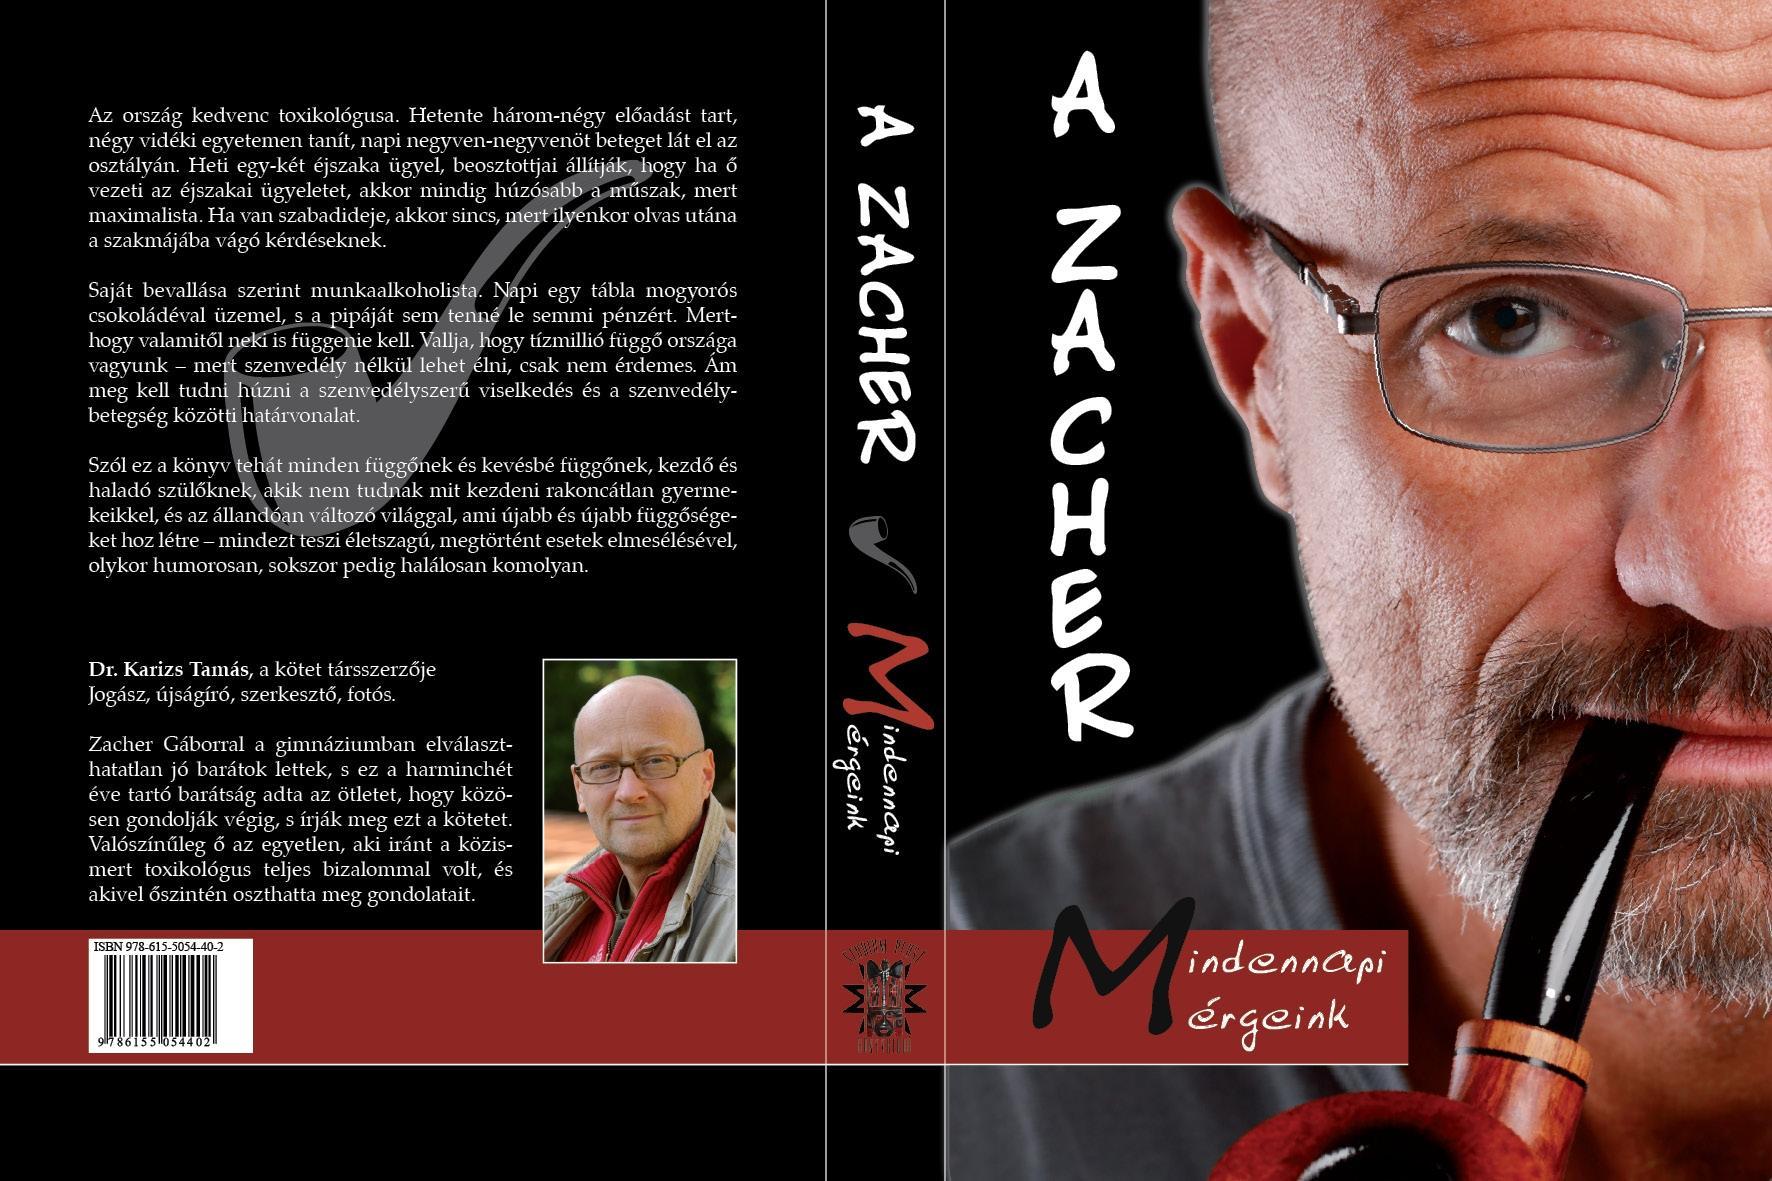 ZACHER GÁBOR  - DR. KARIZS TAMÁS - A ZACHER - MINDENNAPI MÉRGEINK